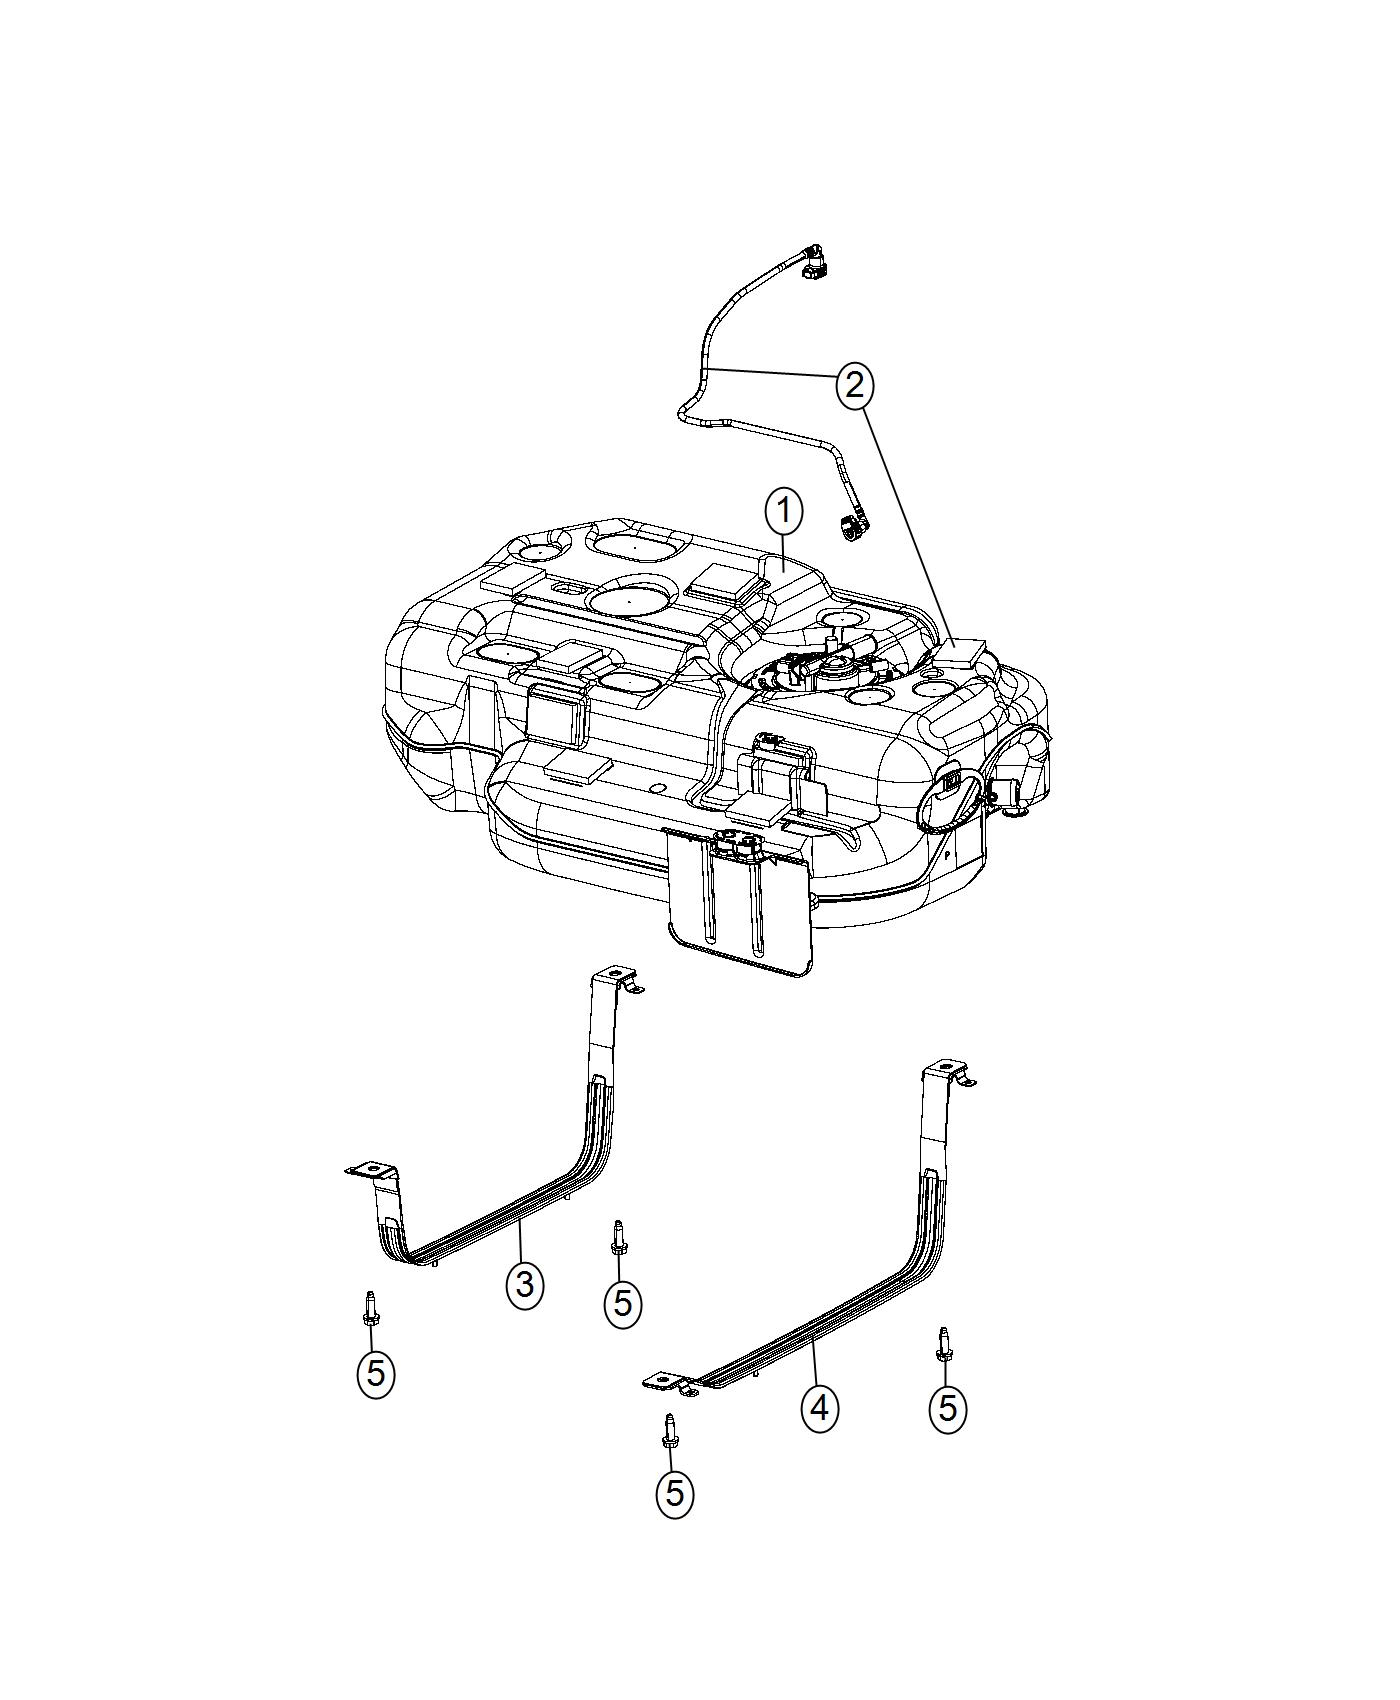 Chrysler Pacifica Strap Fuel Tank Right Vvt Engine